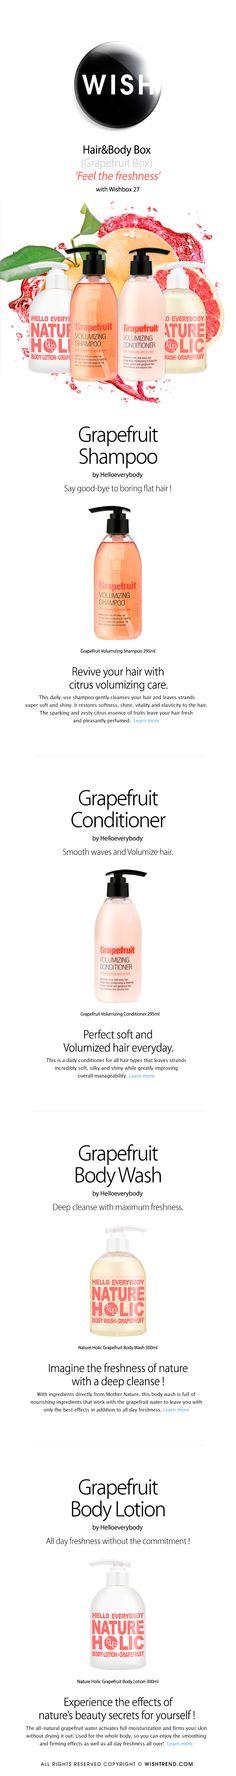 [WISH BOX] WISH BOX (No.27) : Hair&Body Box (Grapefruit Box) Quick Overview: Wishbox No.27 : Hair&Body Box (Grapefruit Box)  Bundle you up ! in the freshness of grapefruites.  Contents :  [H.E.B] Grapefruit Volumizing Shampoo [H.E.B] Grapefruit Volumizing Conditioner [H.E.B] Grapefruit Body Wash [H.E.B] Grapefruit Body Lotion